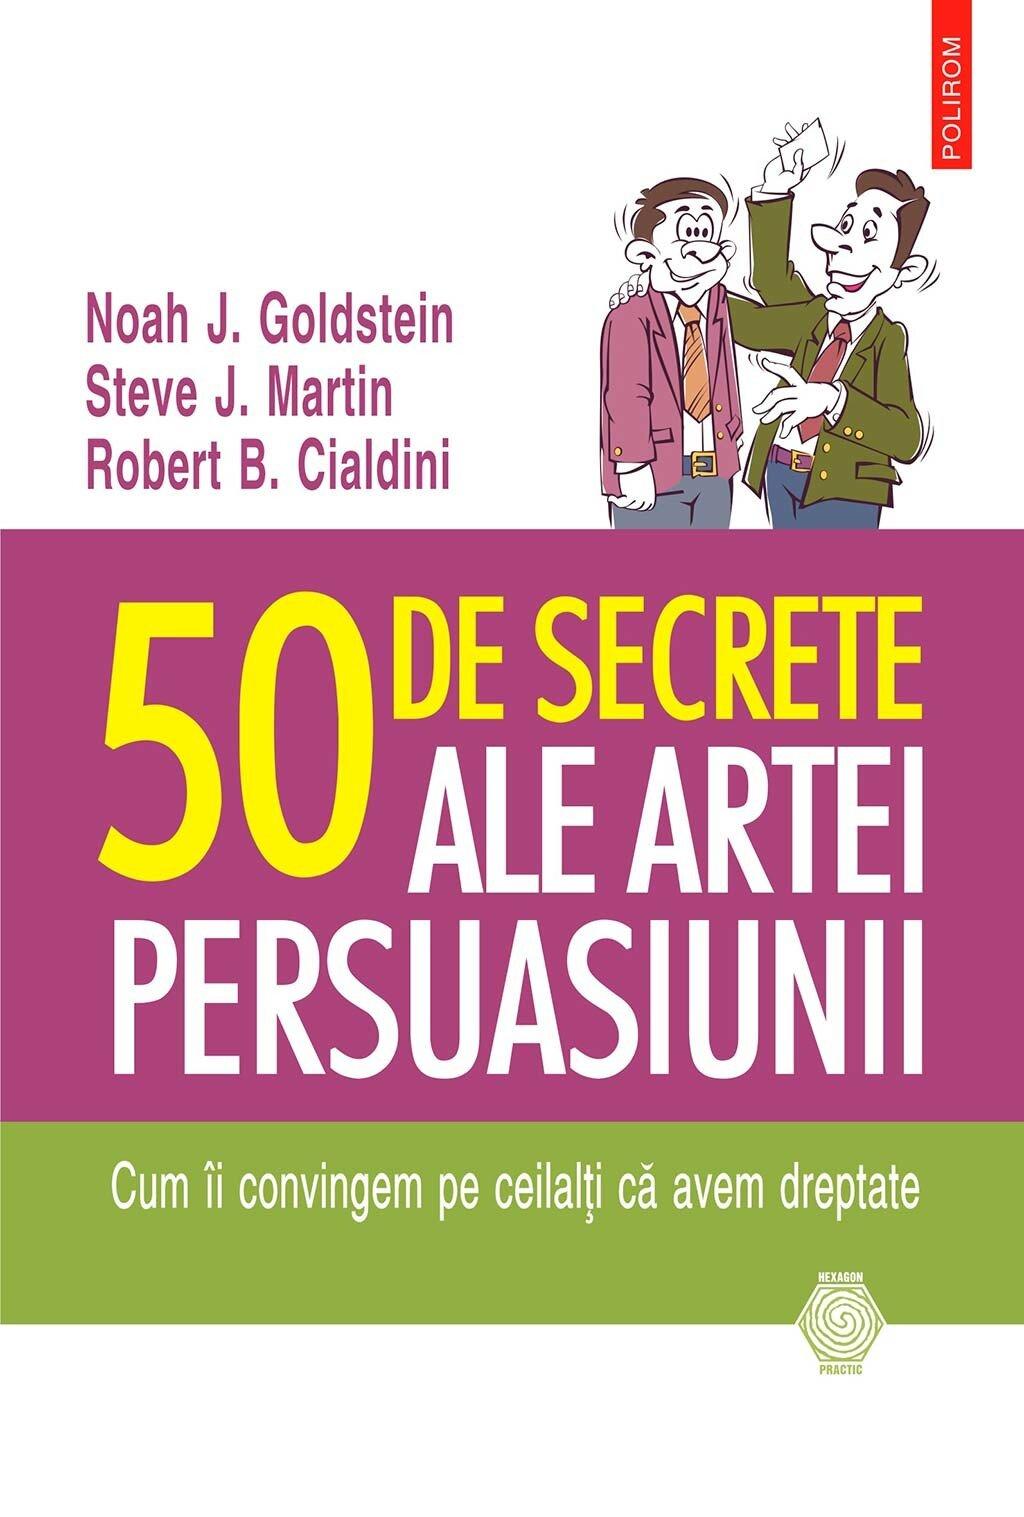 50 de secrete ale artei persuasiunii. Cum ii convingem pe ceilalti ca avem dreptate PDF (Download eBook)